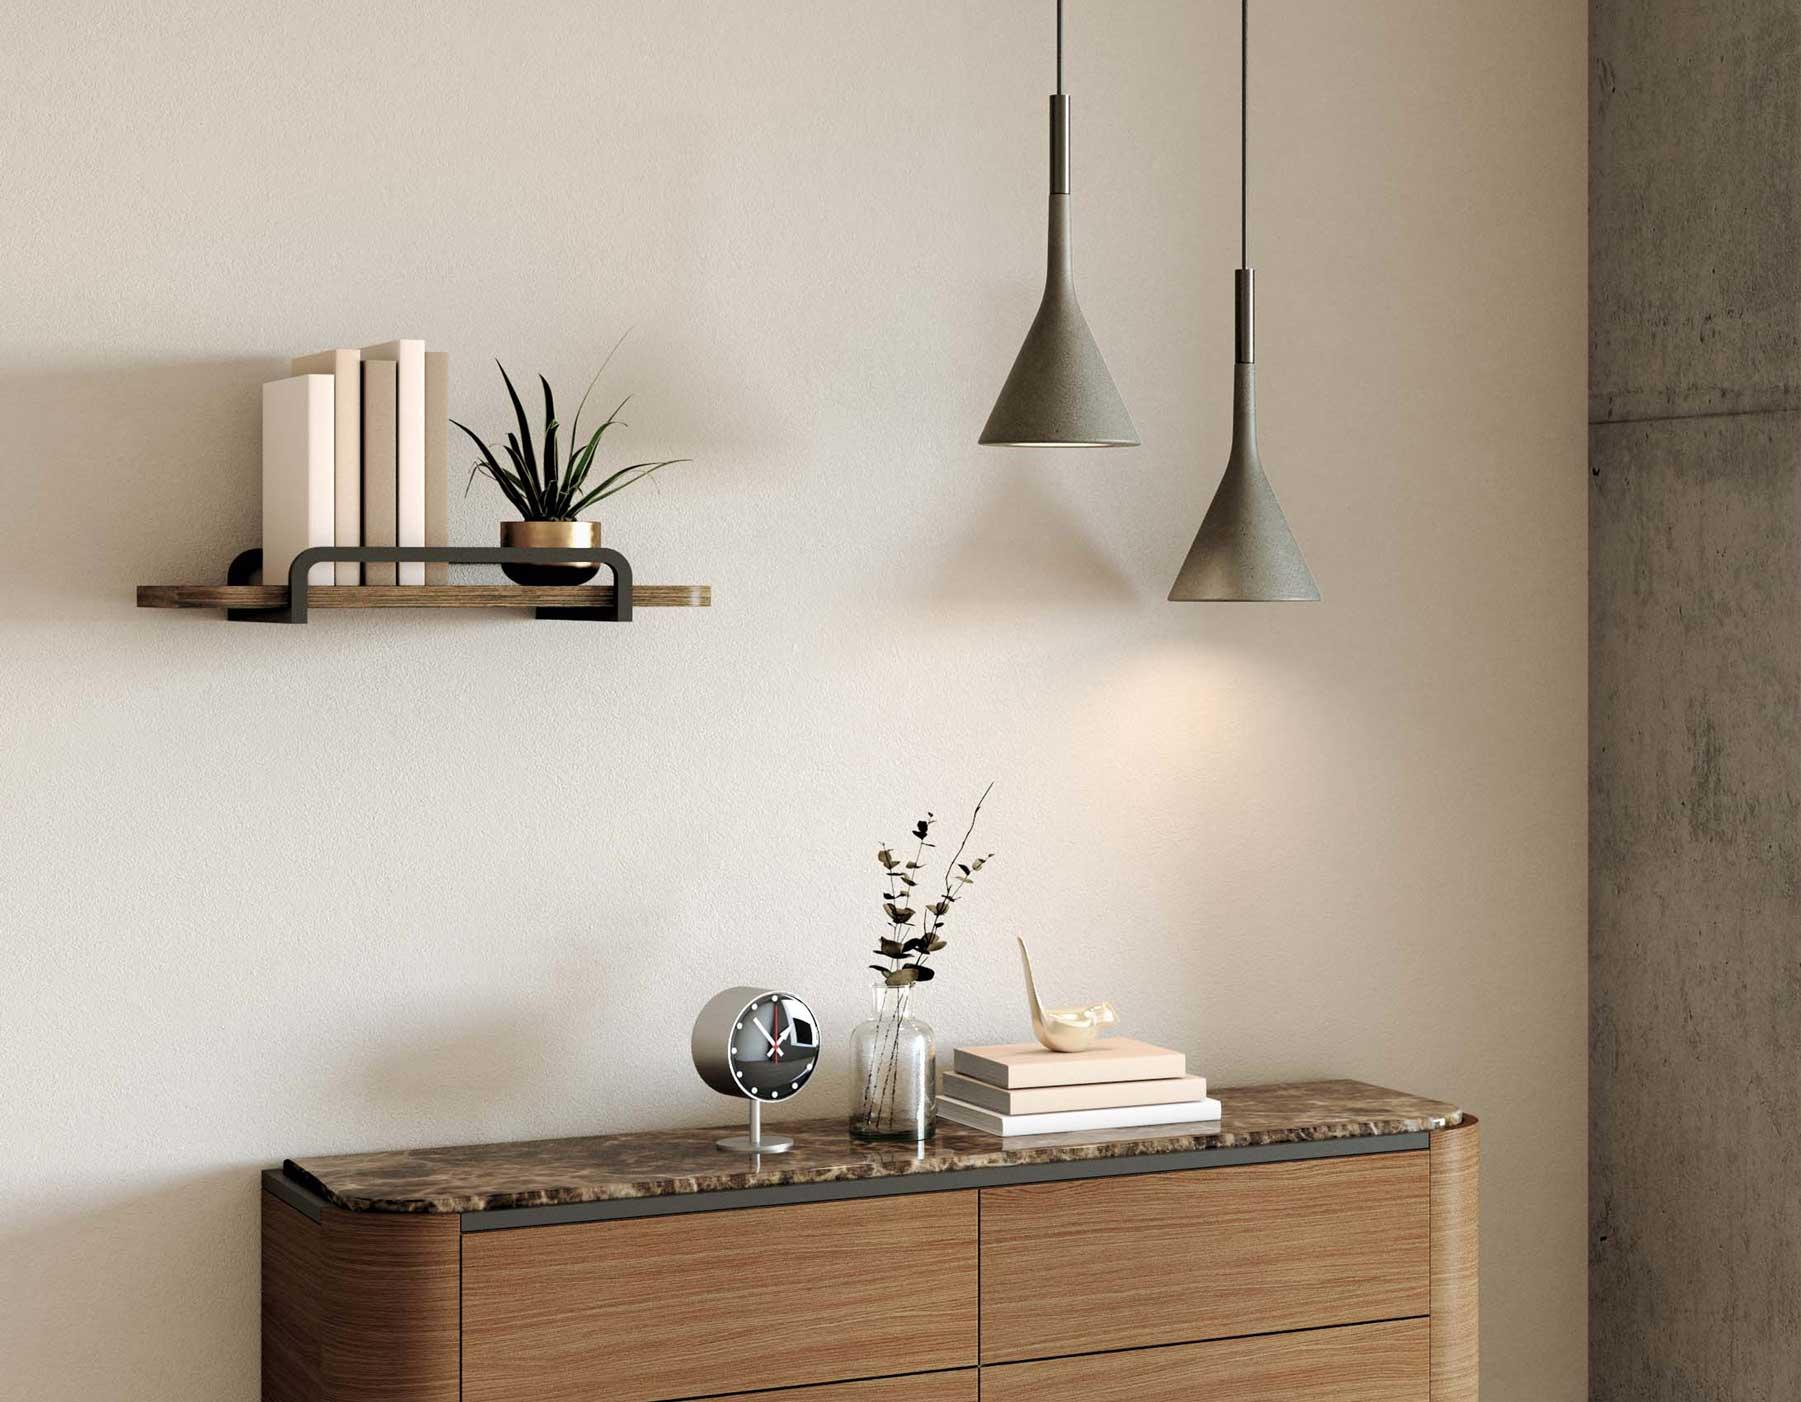 Adara Light Shelves